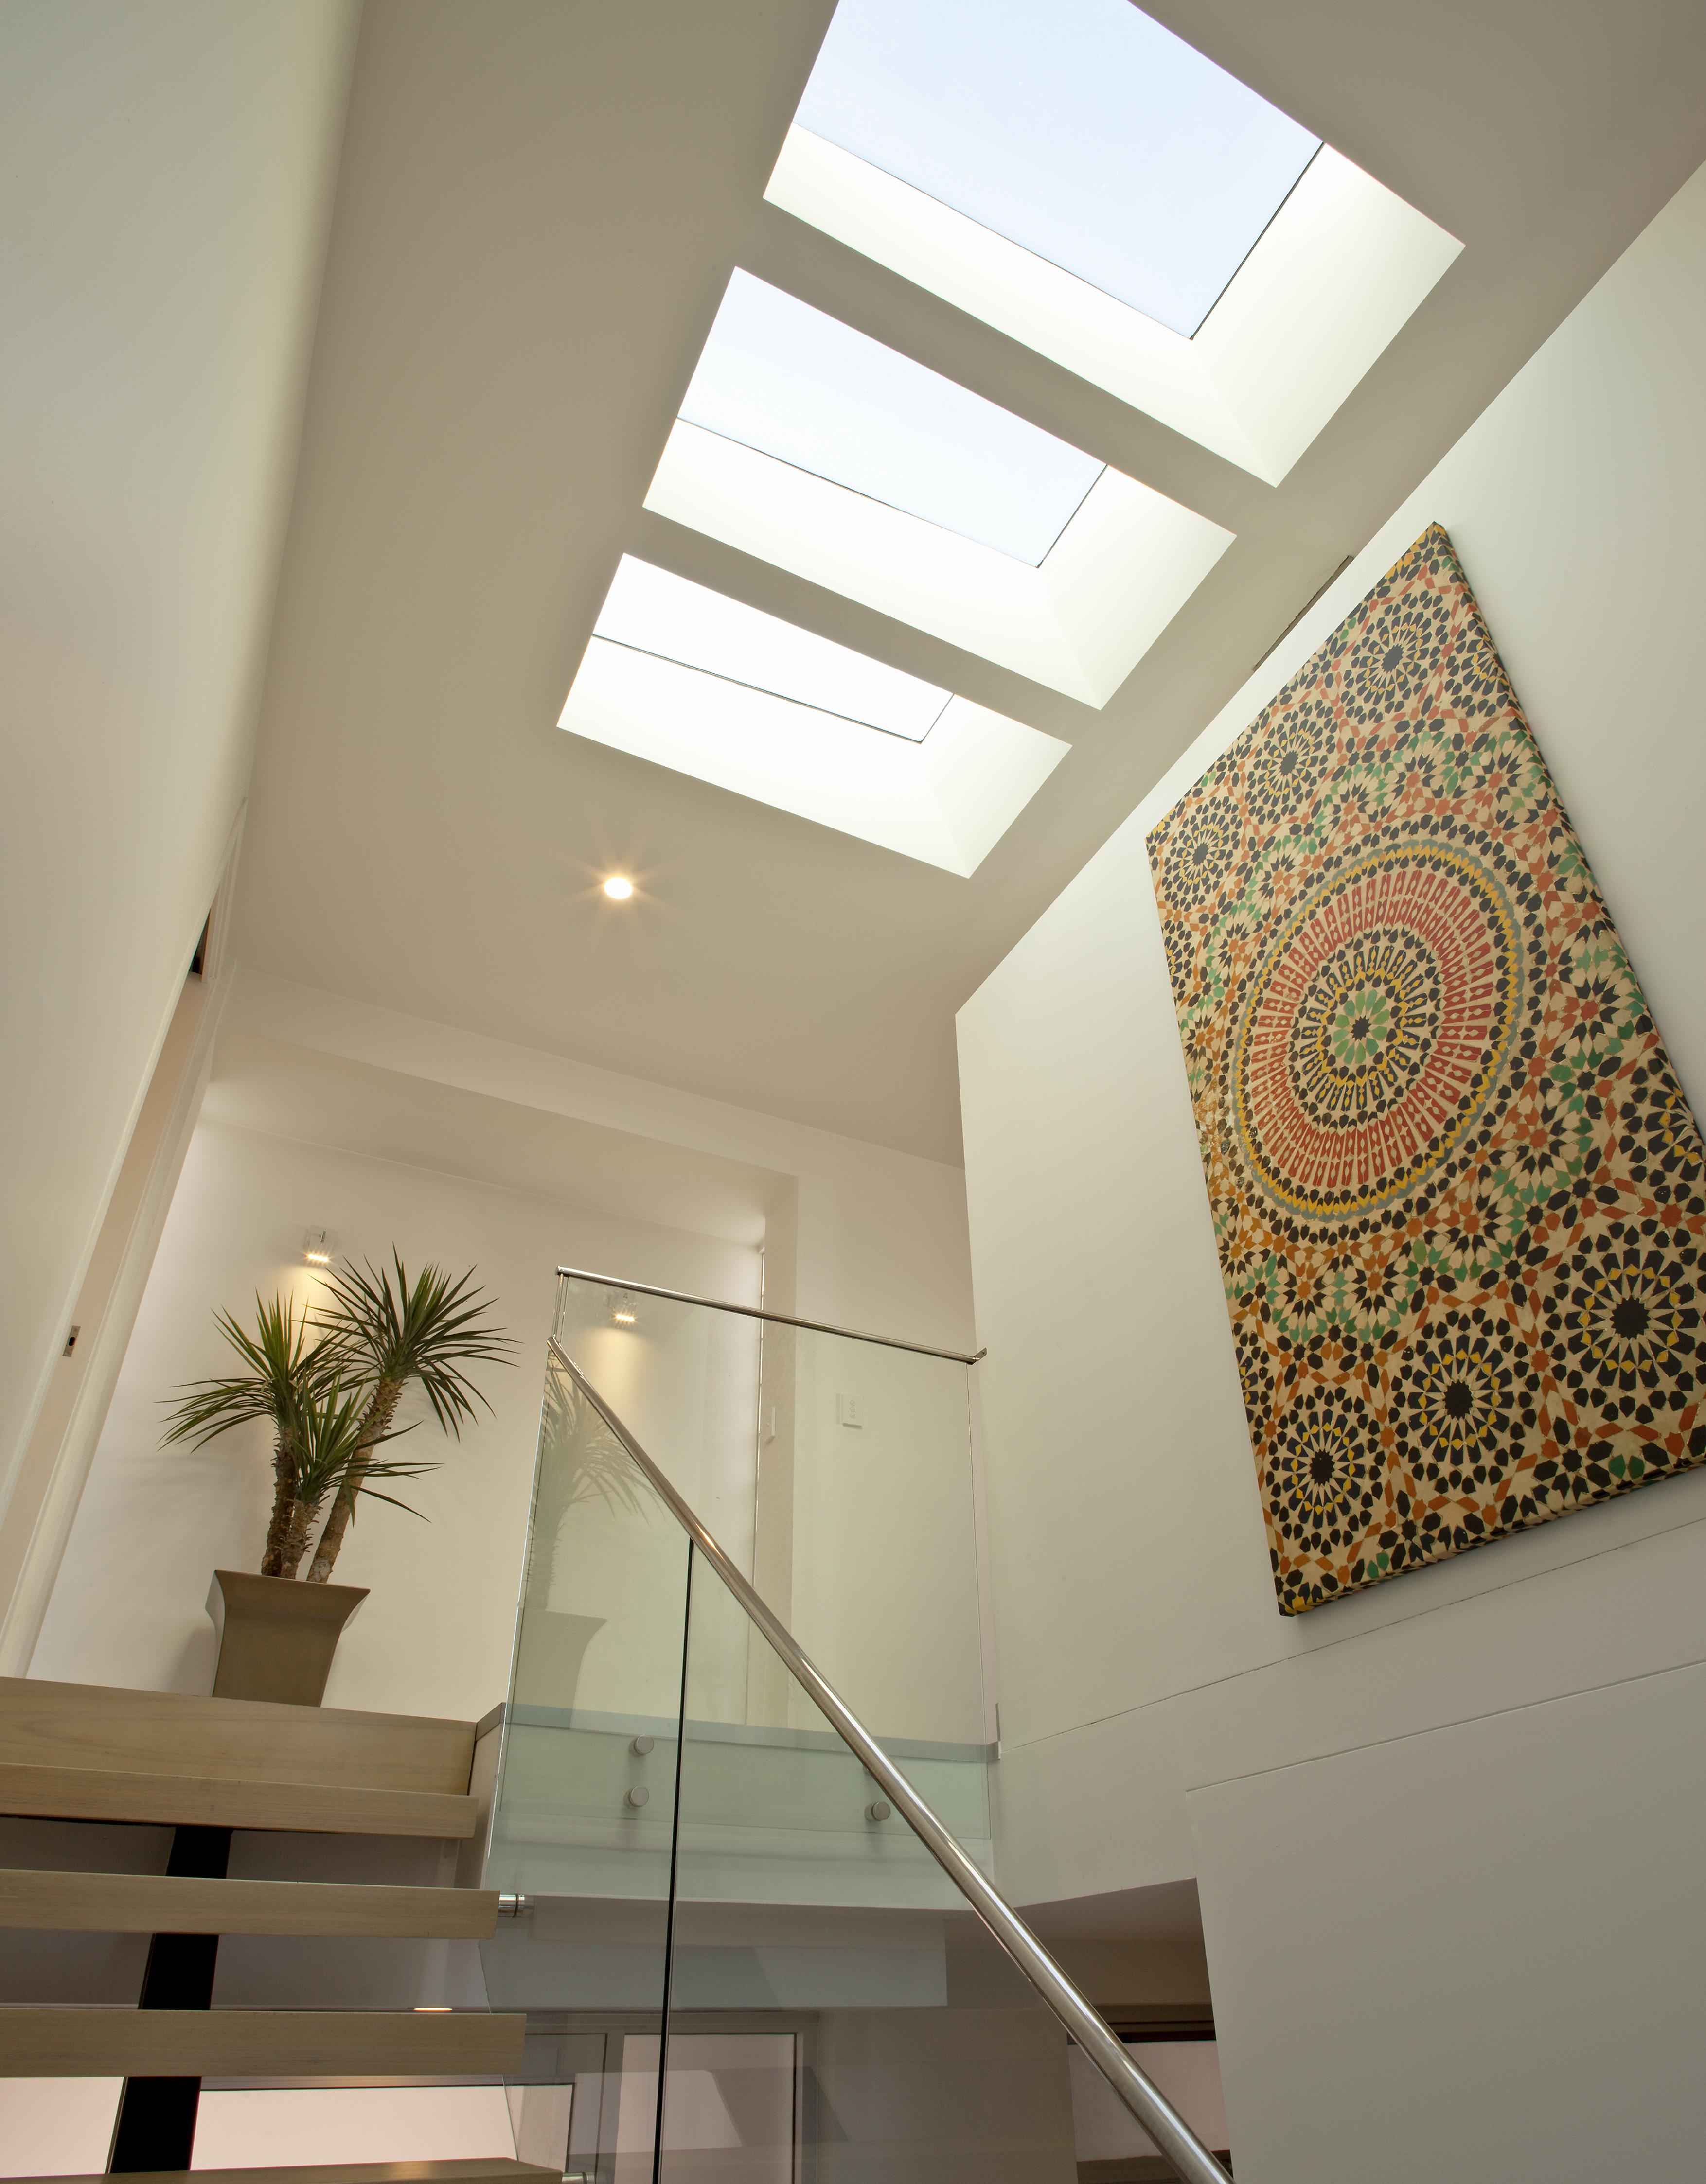 skylight in stairwell